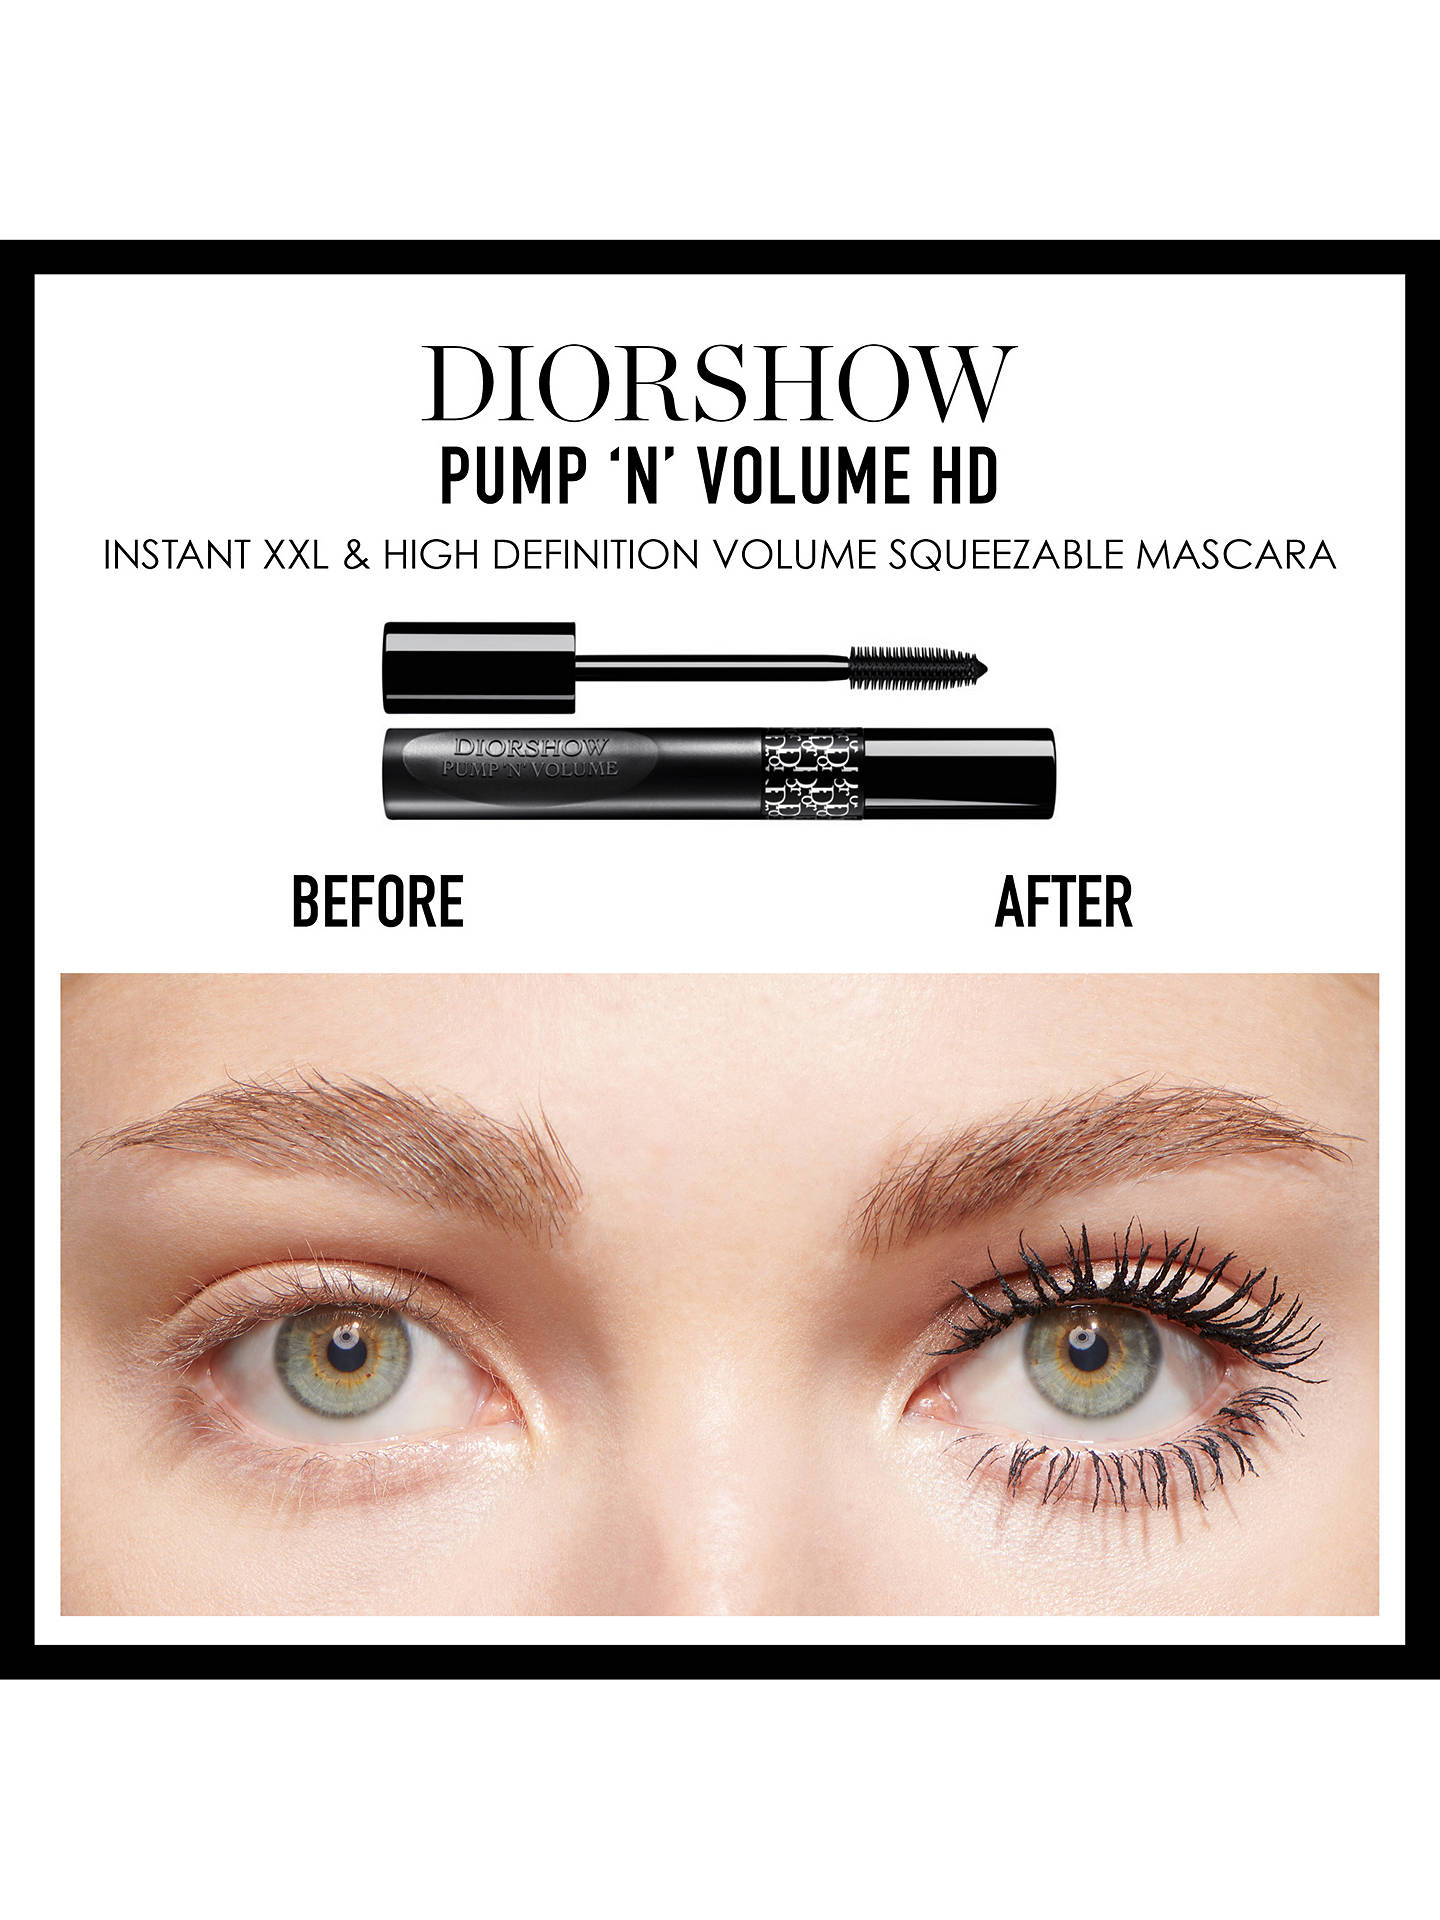 085a7332ce1 ... Buy Dior Diorshow Pump 'N' Volume HD Mascara, 090 Black Online at  johnlewis ...